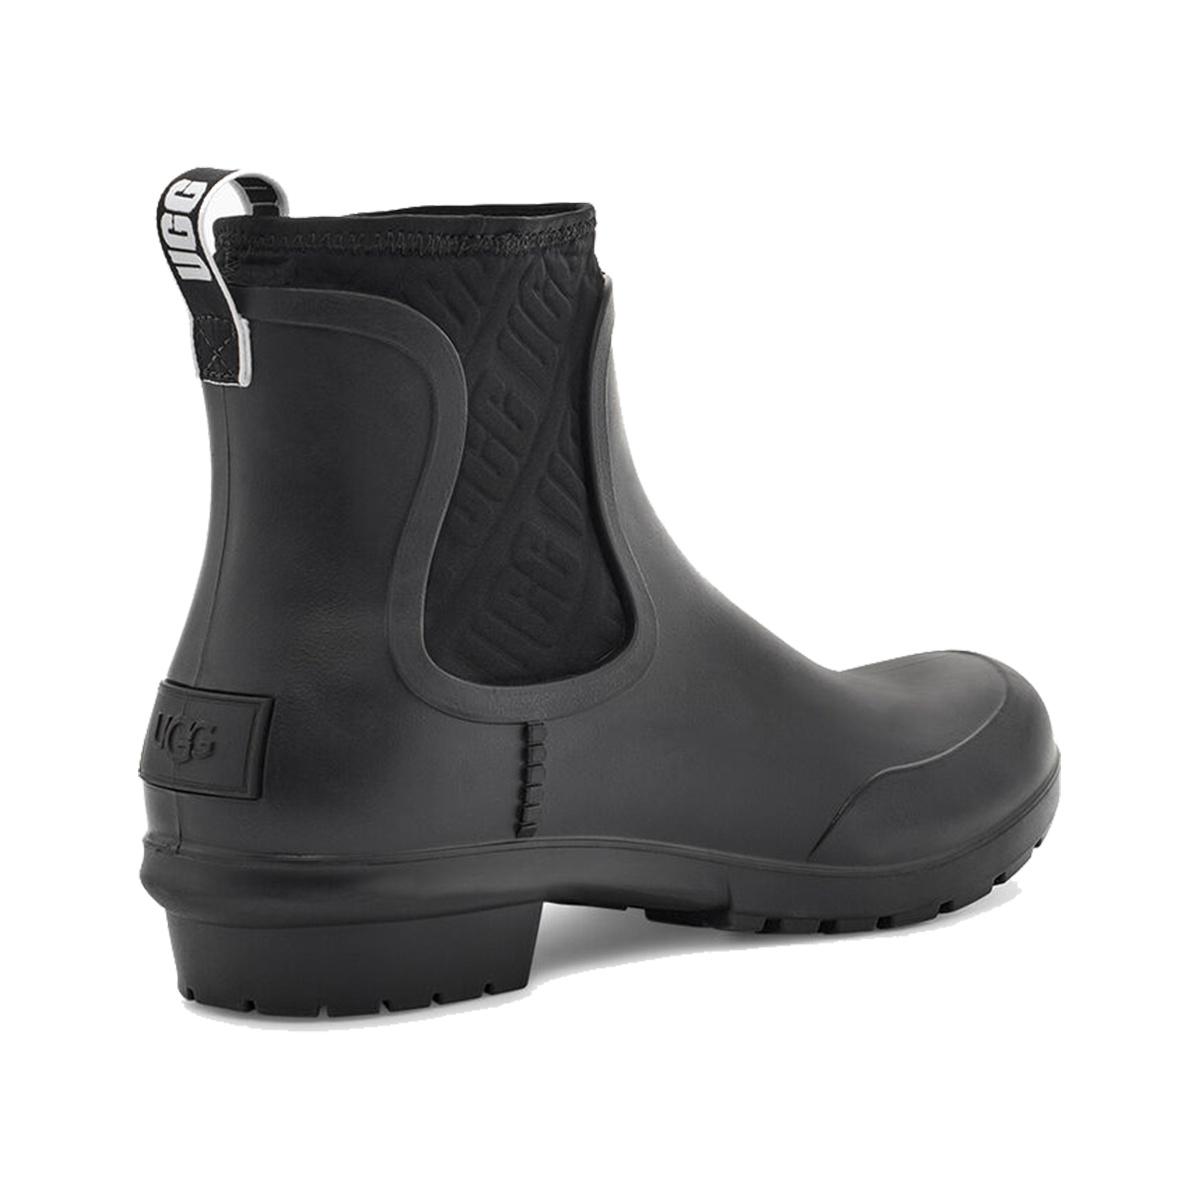 UGG Chevonne Rainboot Womens (Black) 1110650